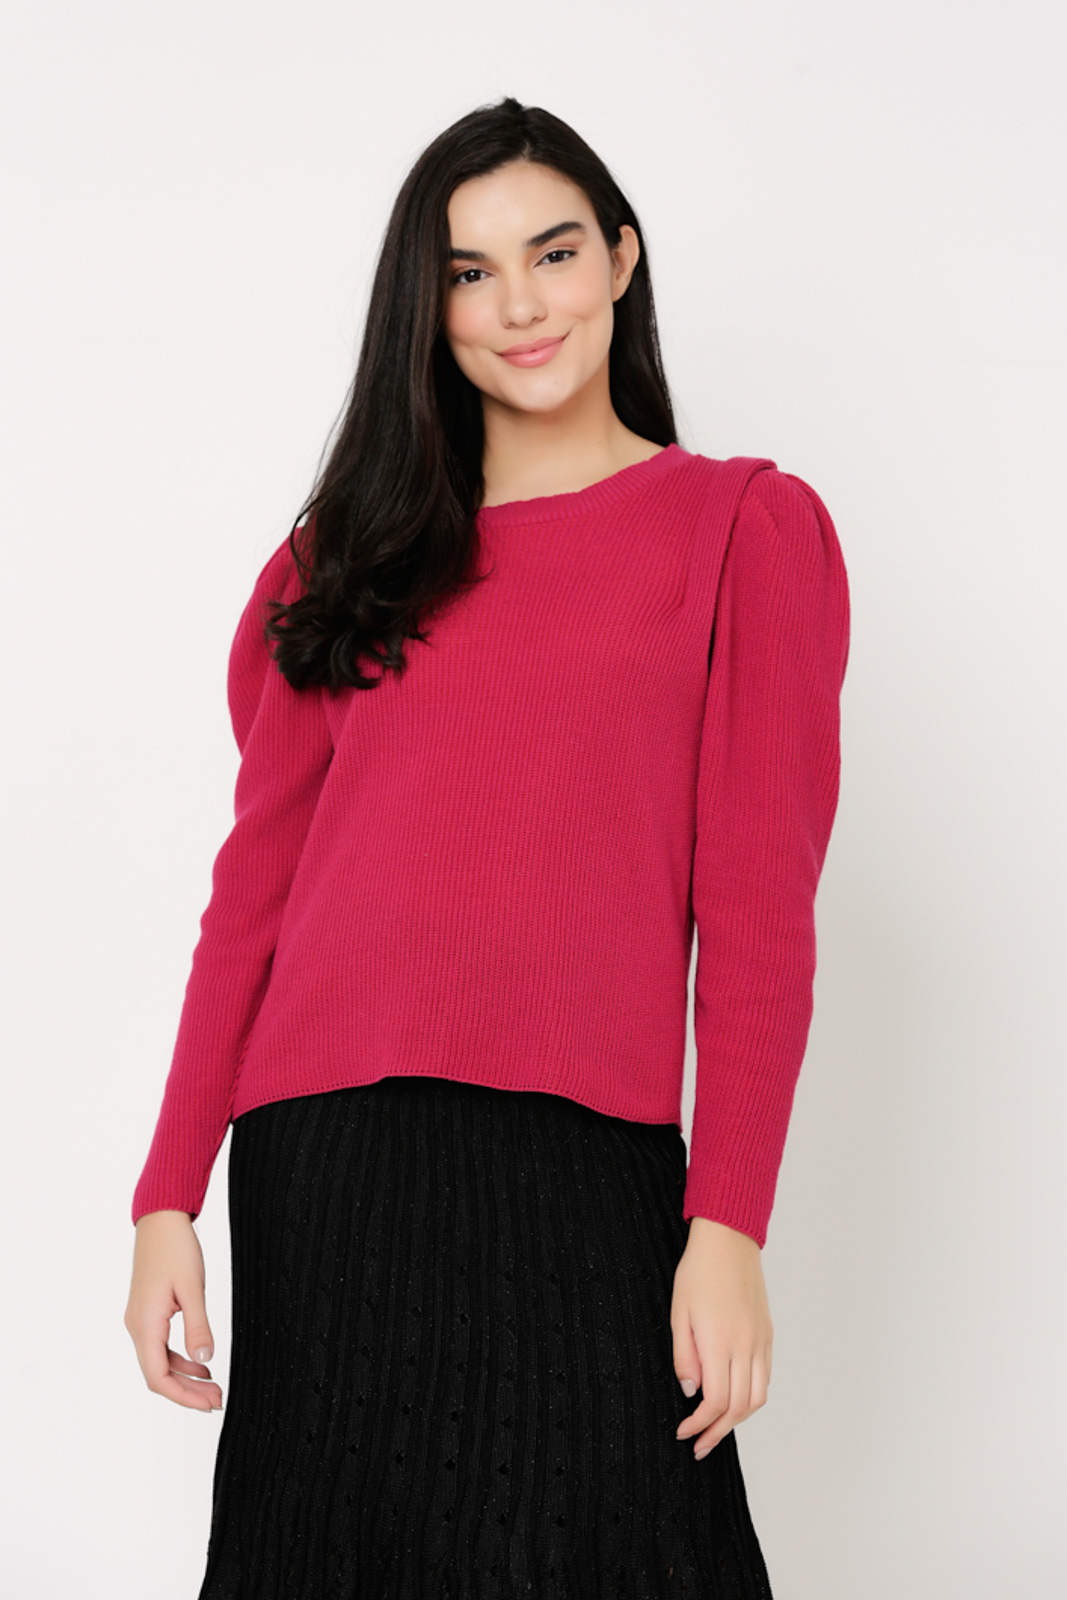 Blusa suéter Ralm de Tricot manga bufante - Pink